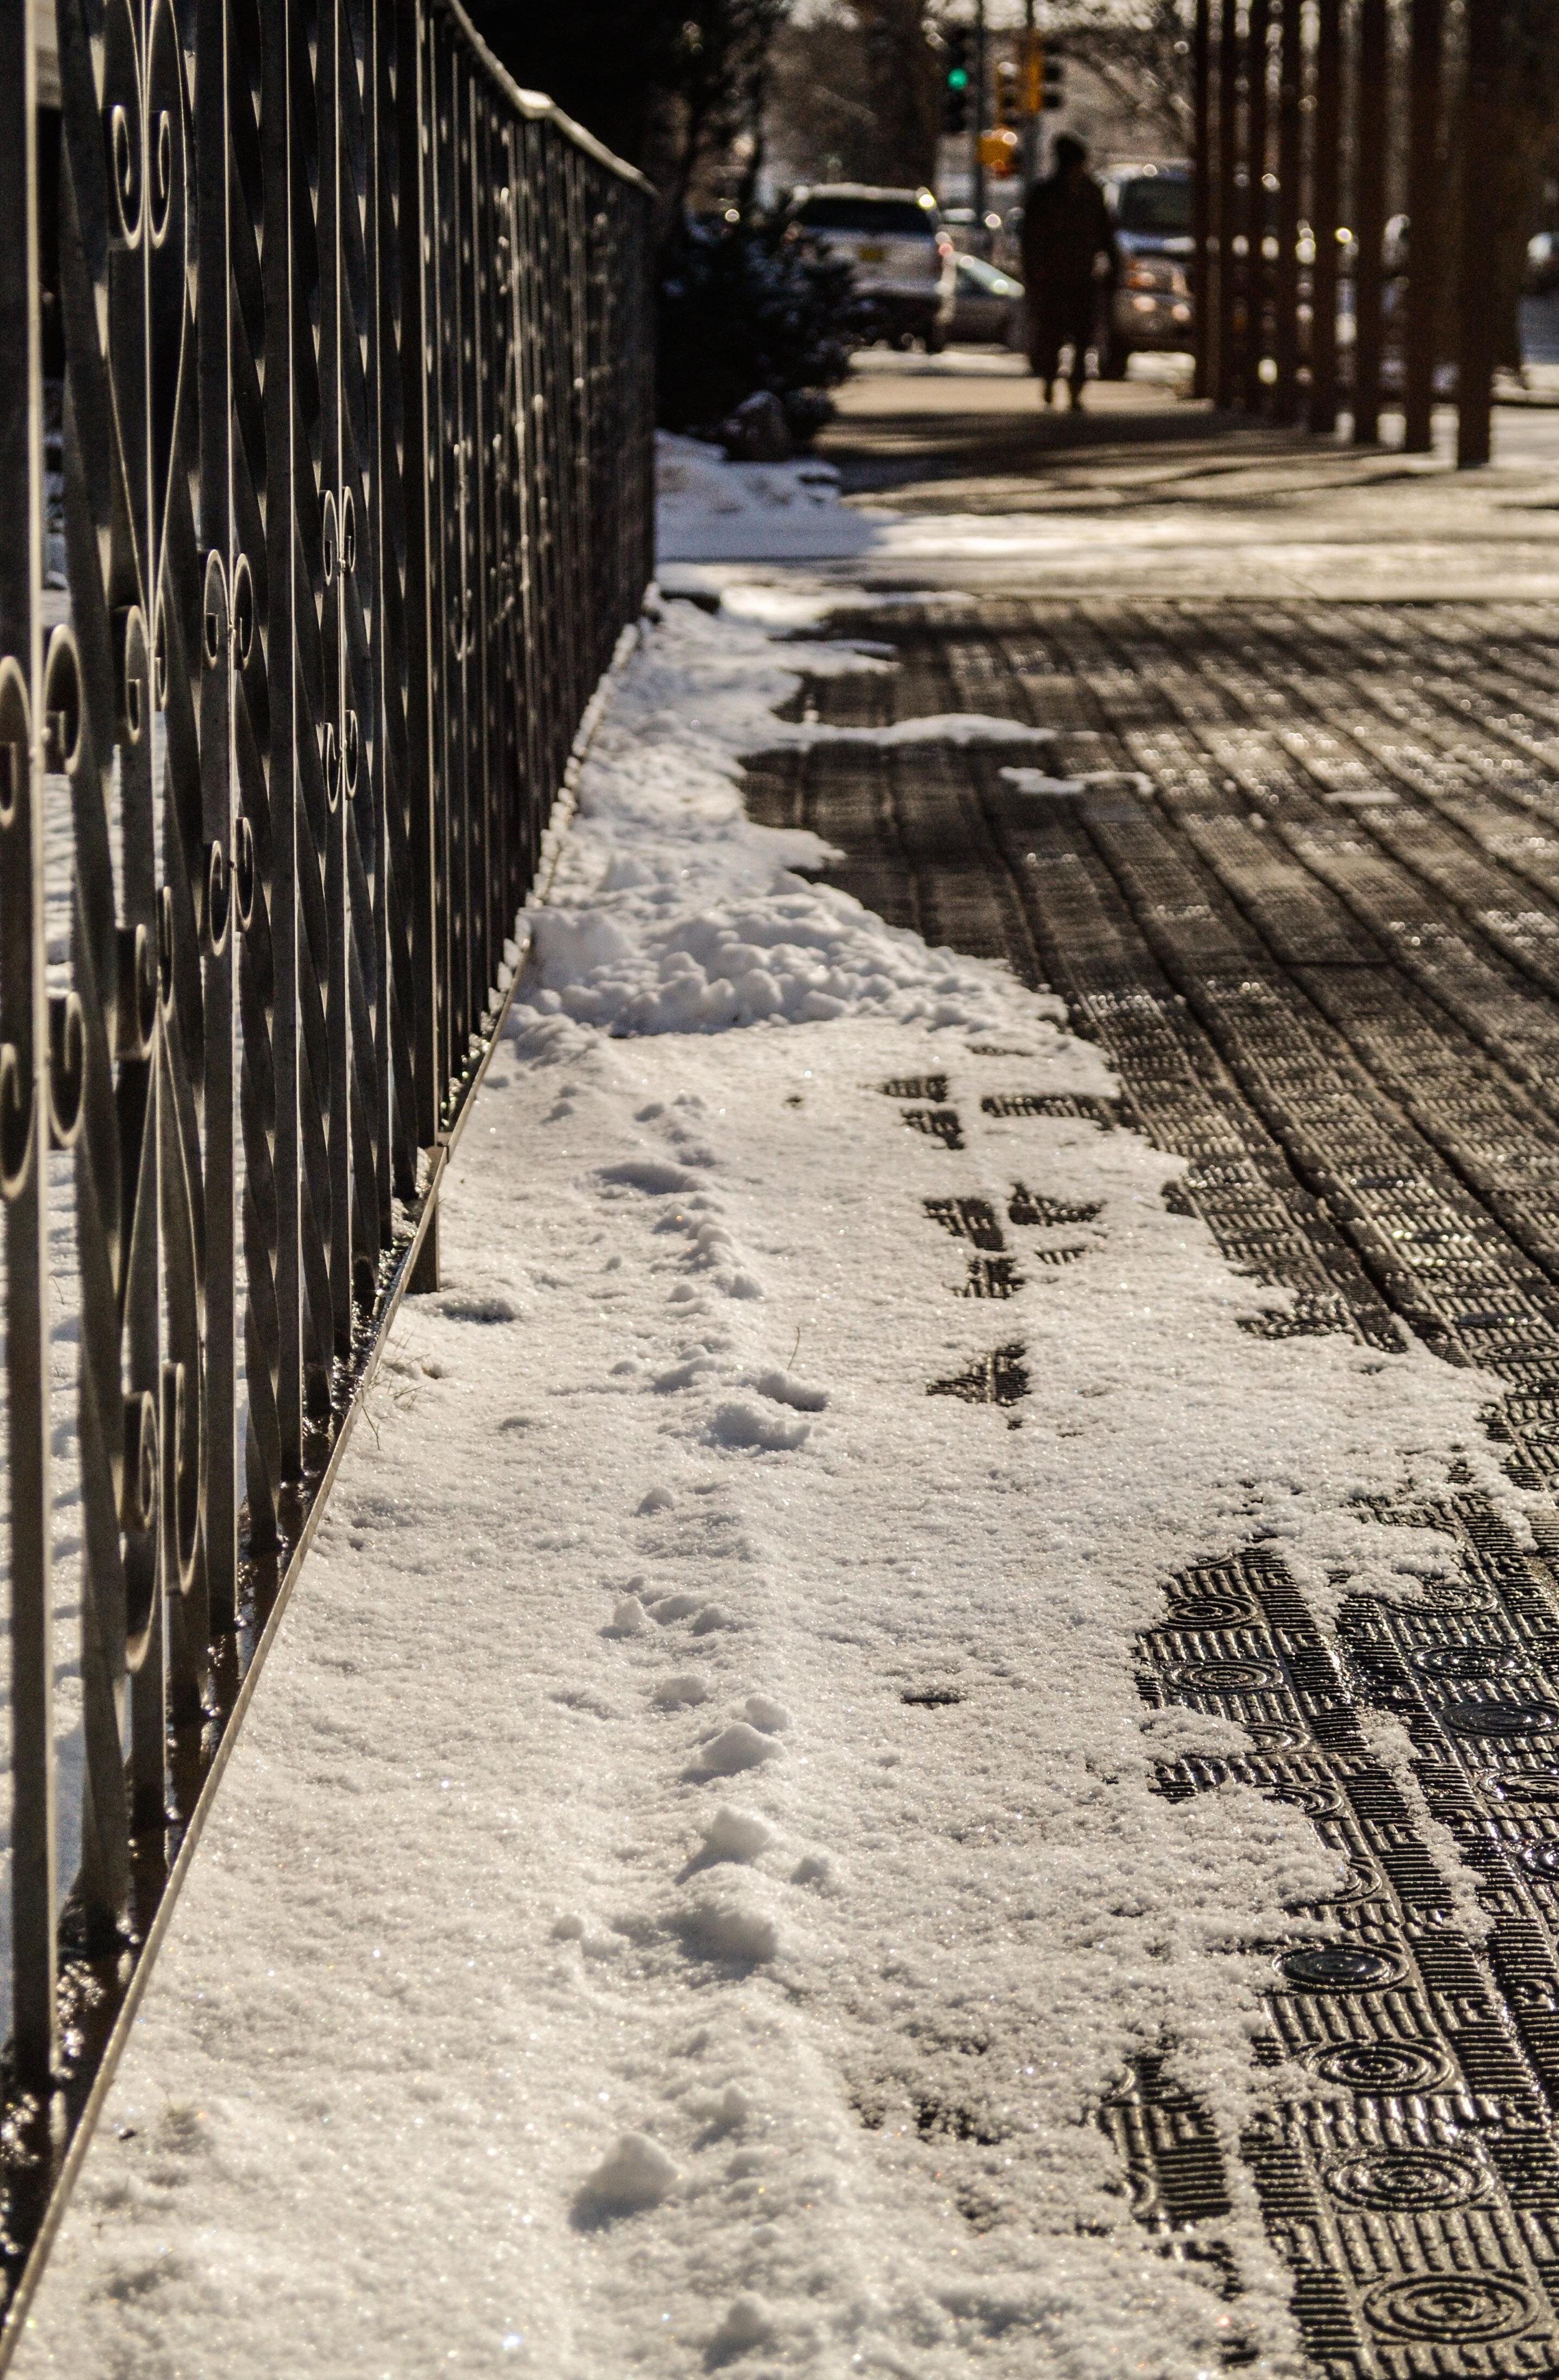 Santa Fe sidewalk (photo: Andy Bruner)